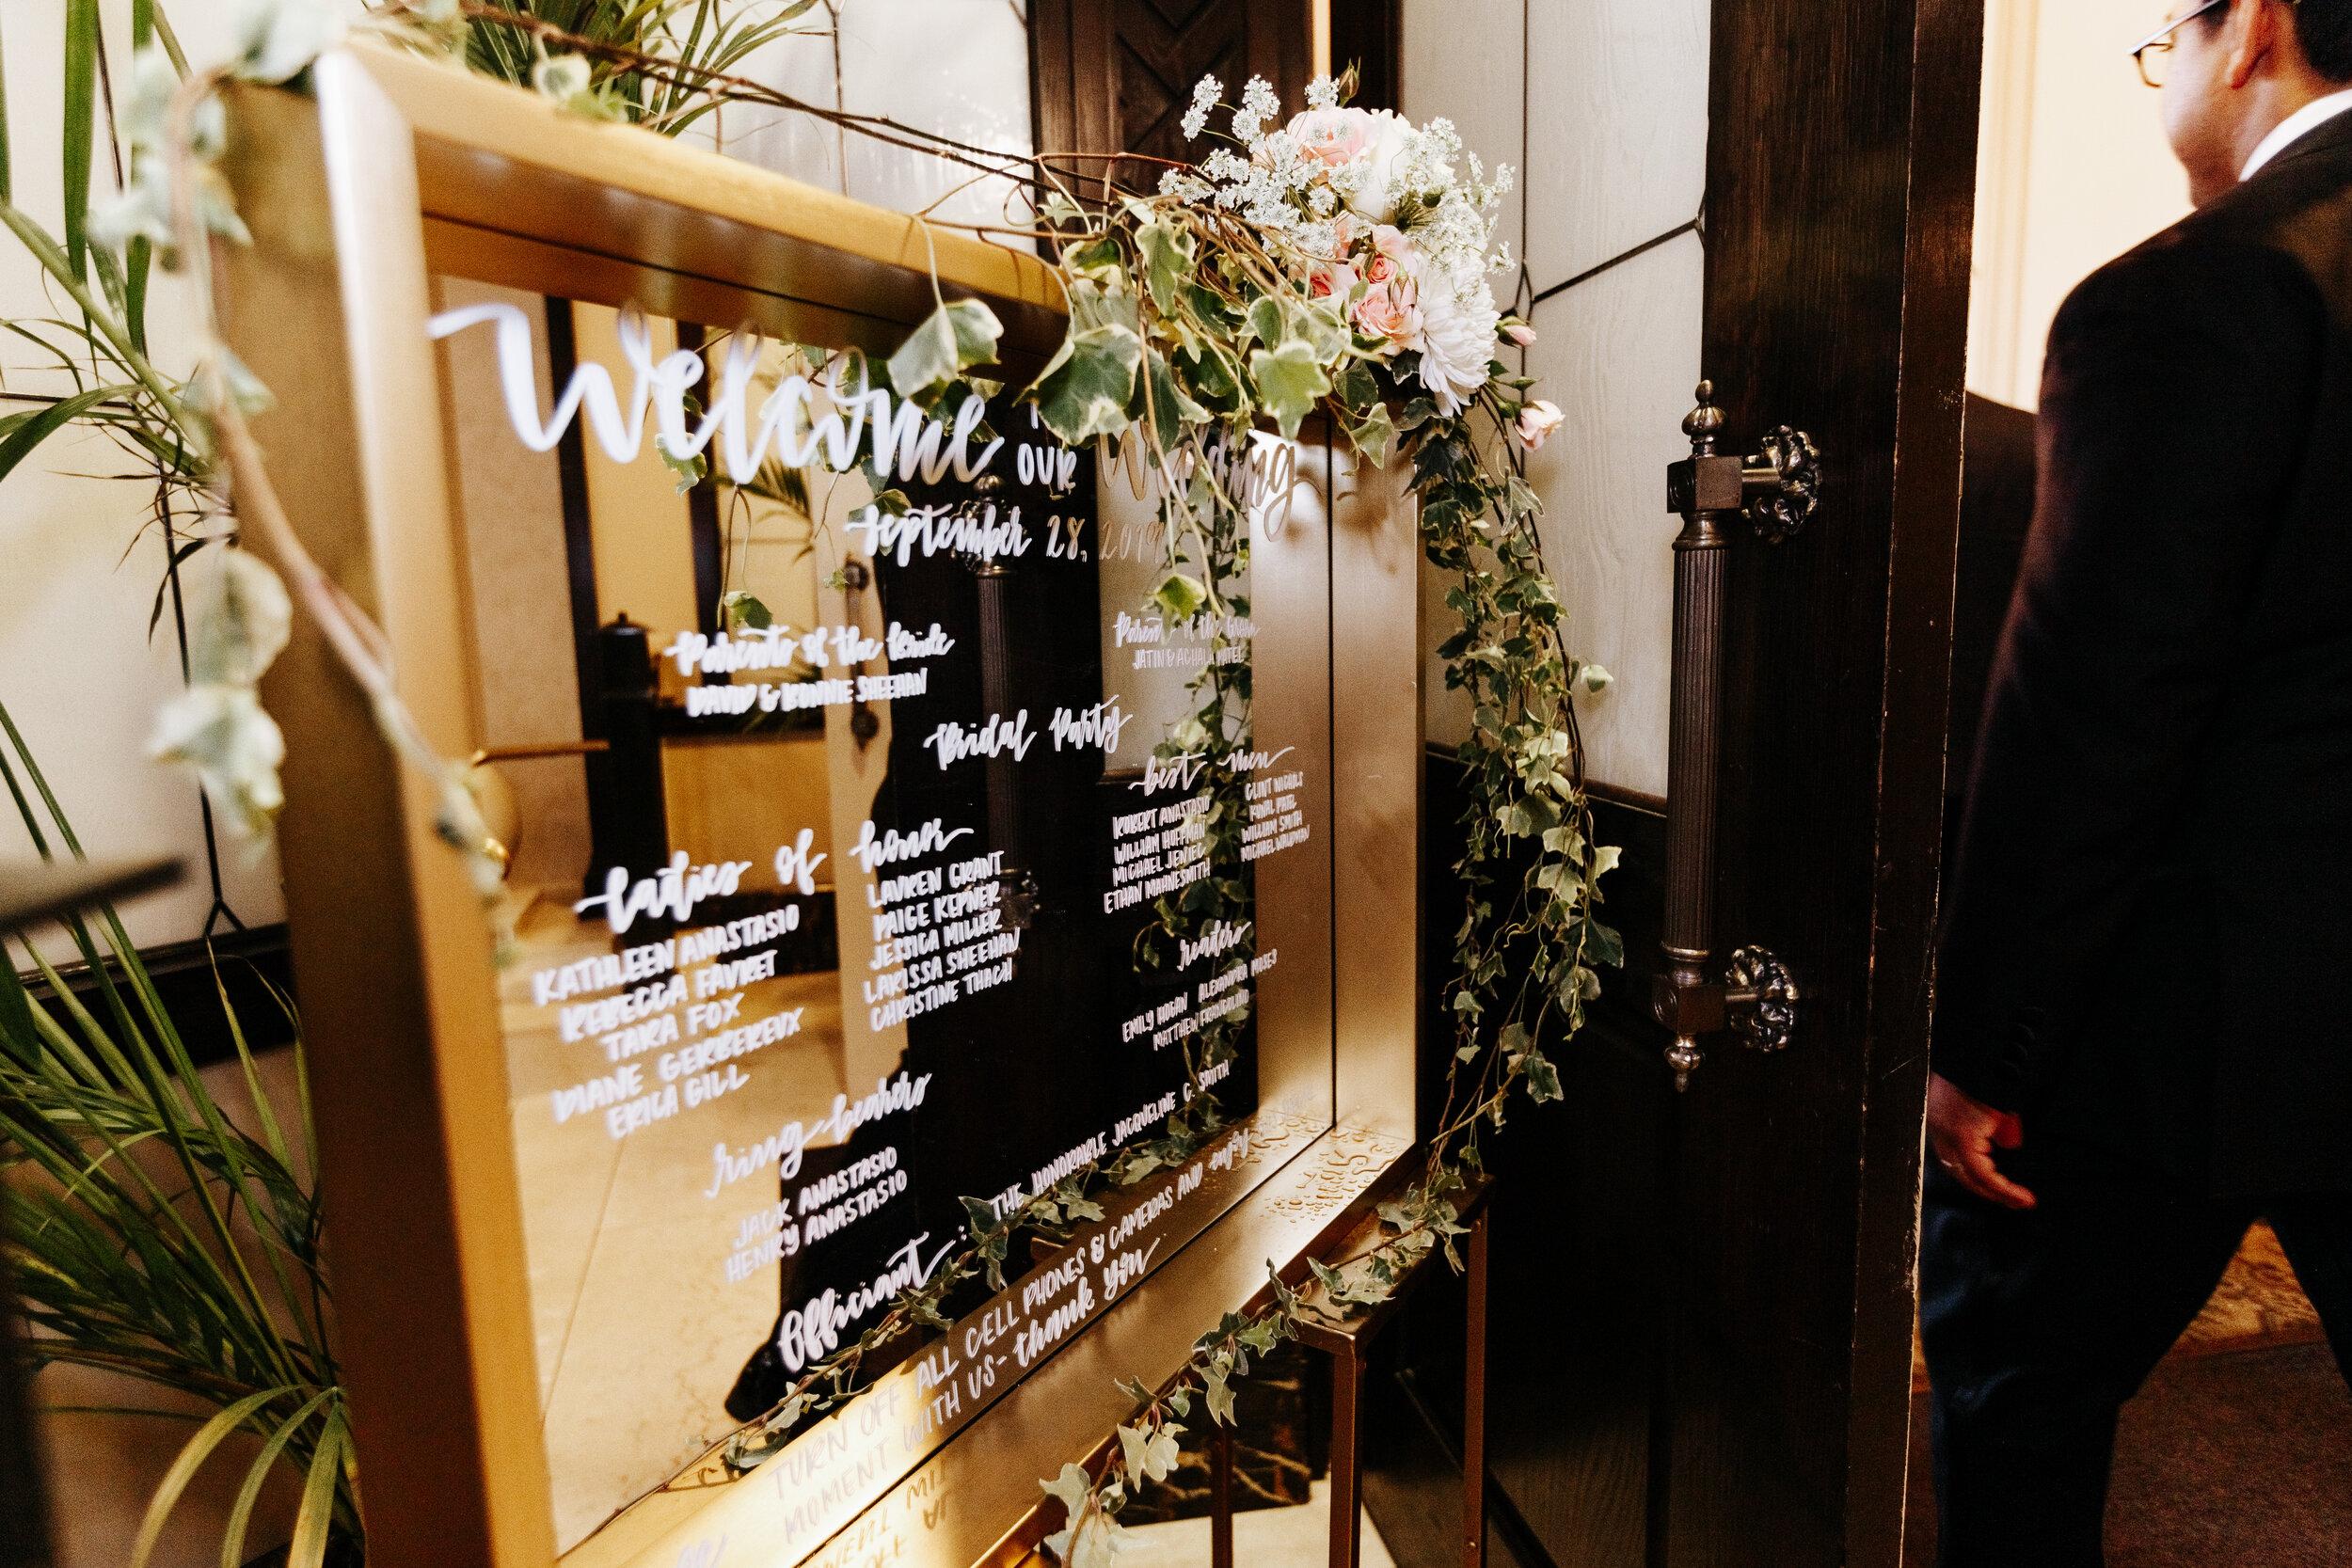 Cassie-Mrunal-Wedding-Quirk-Hotel-John-Marshall-Ballrooms-Richmond-Virginia-Photography-by-V-60.jpg